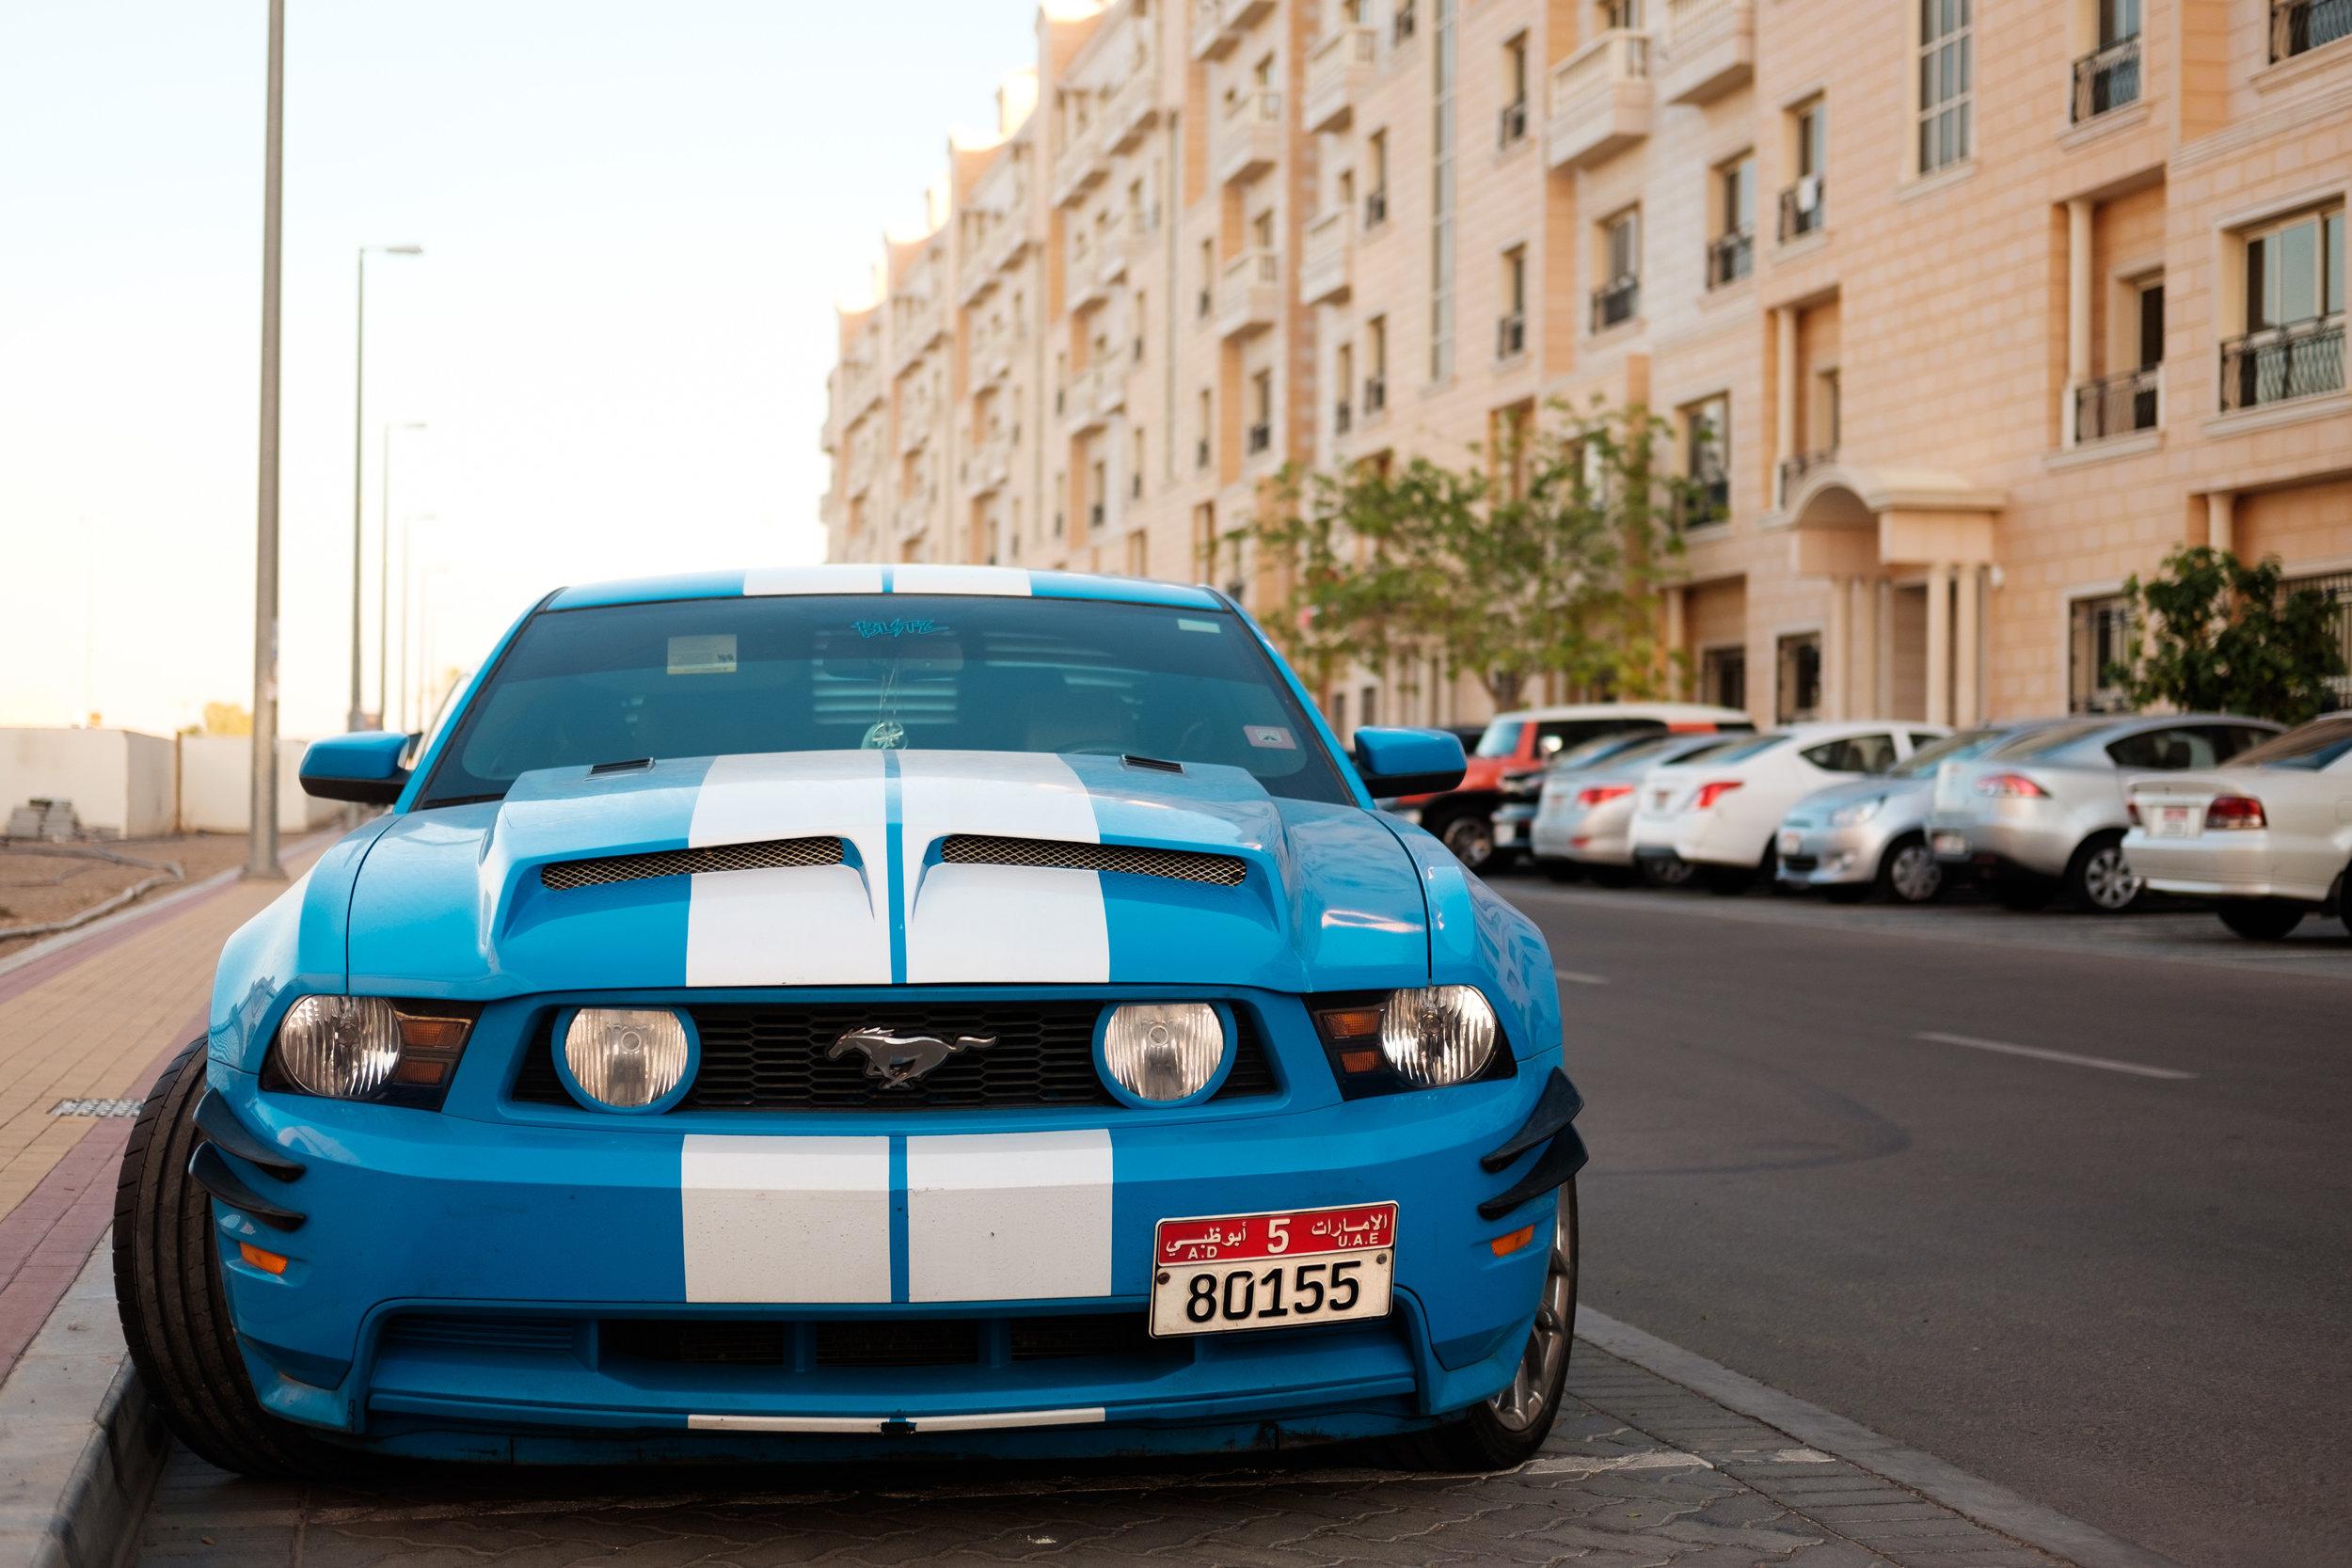 Ford Mustang in Al Ain